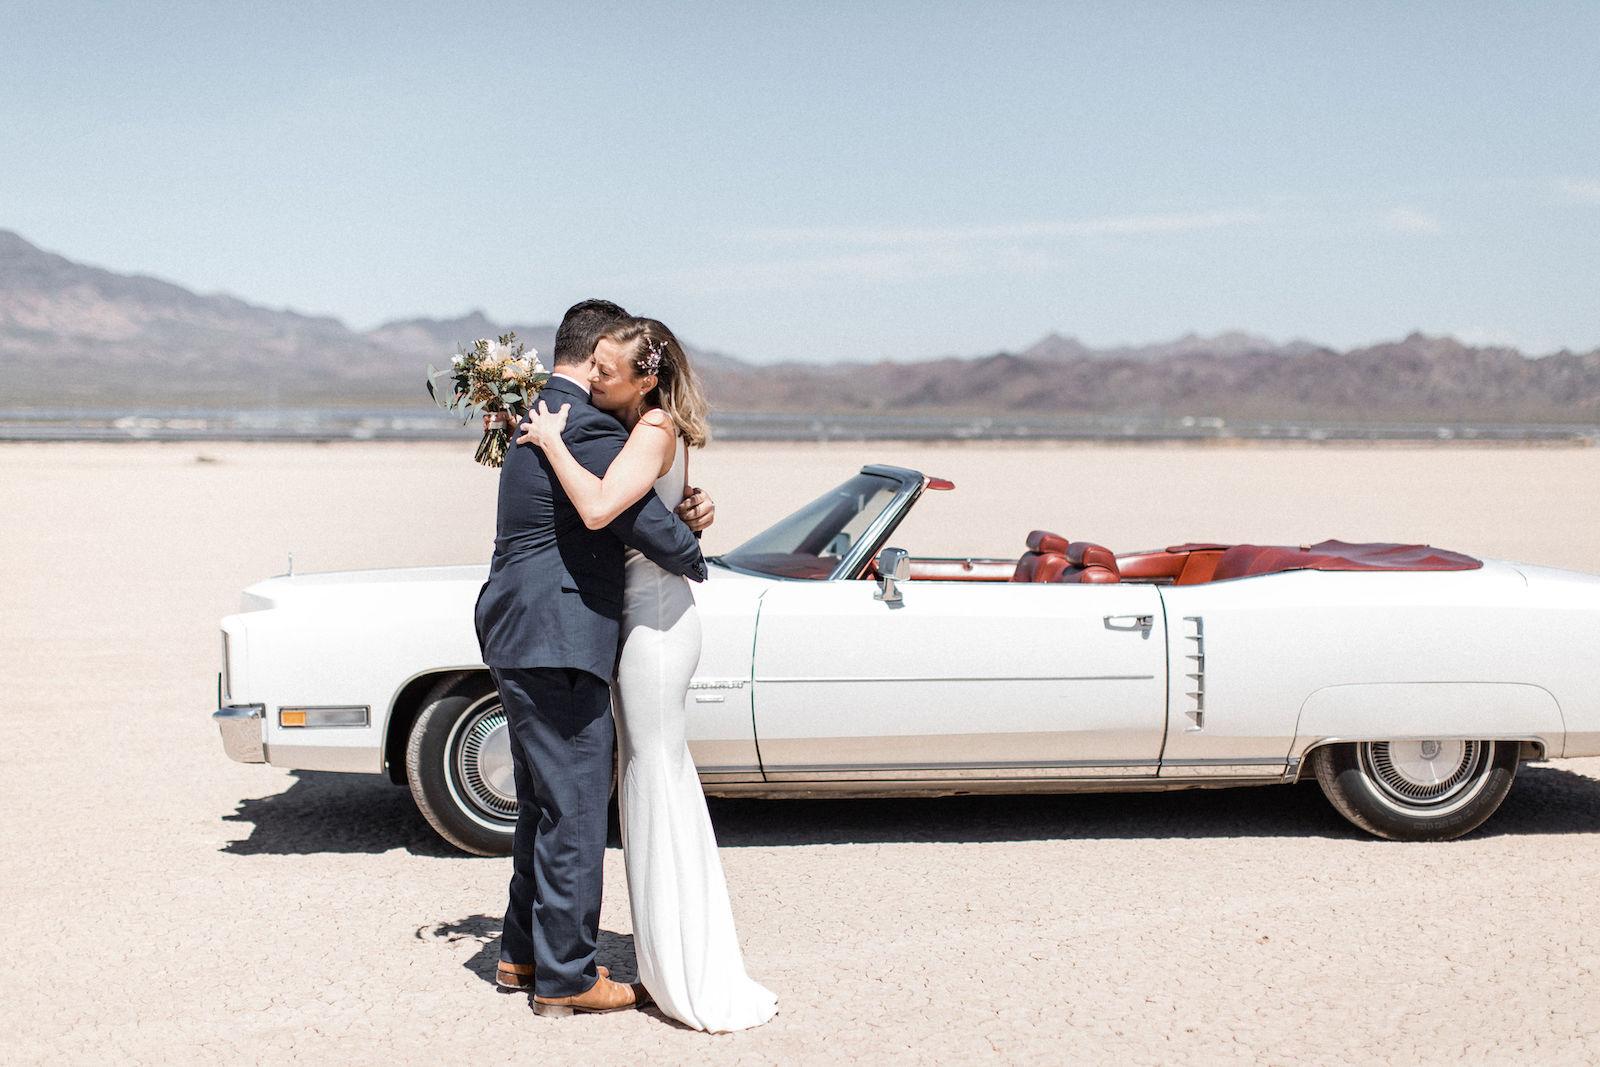 cadillac convertible dry lake bed elopement 00004.jpg